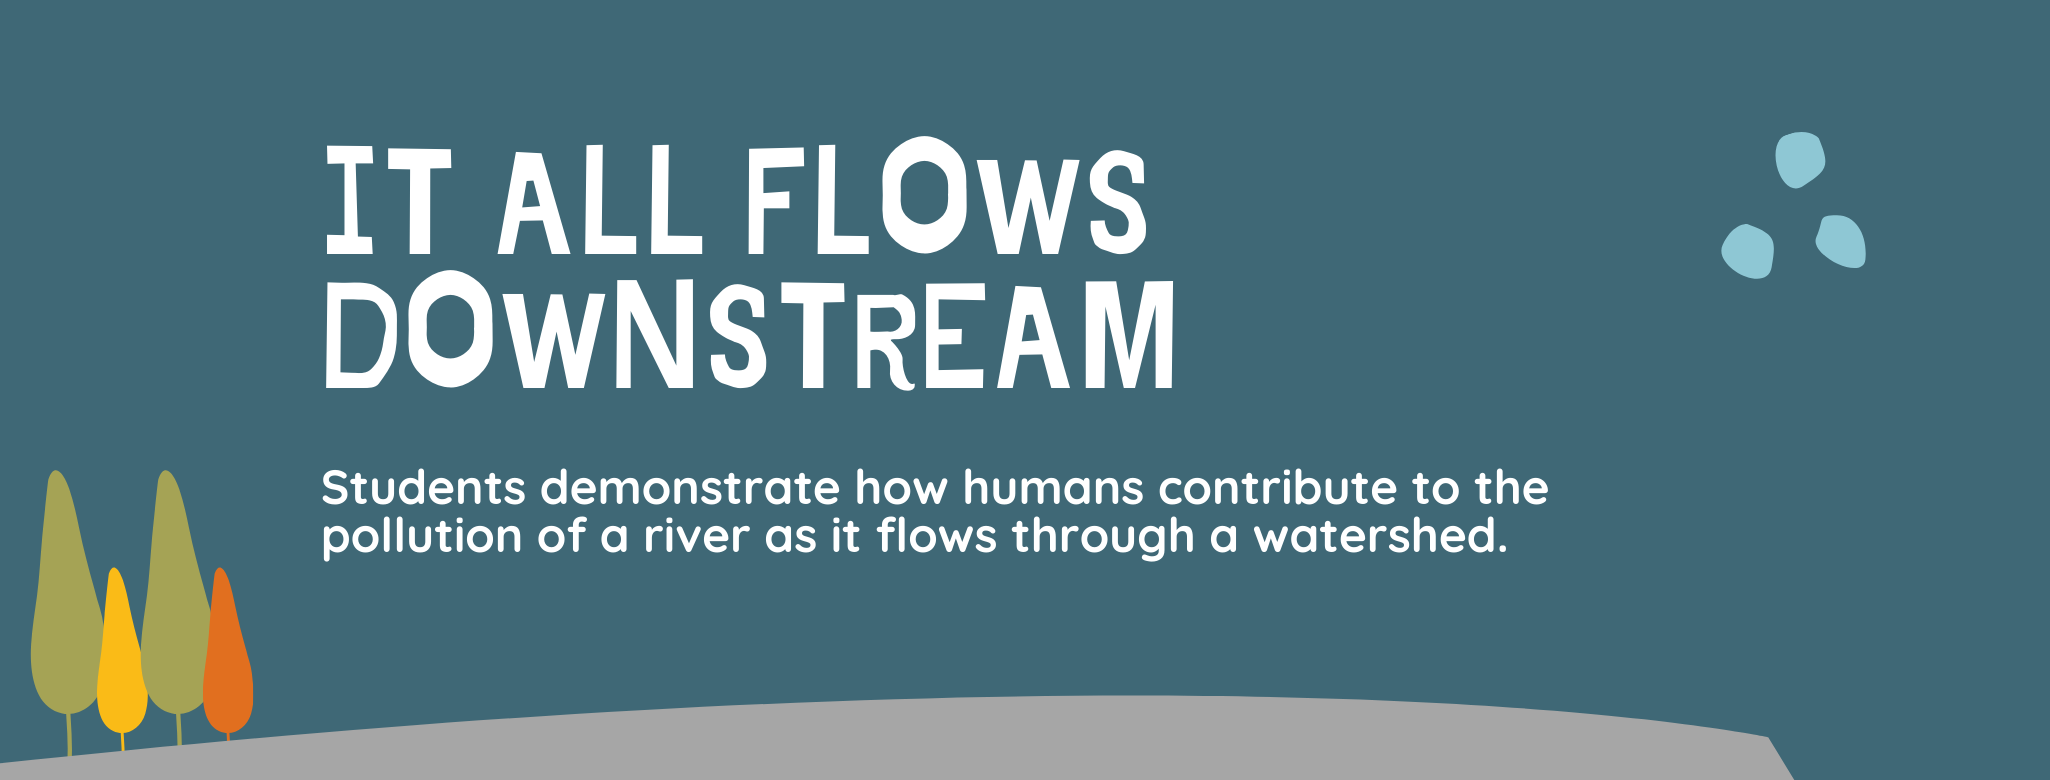 It All Flows Downstream